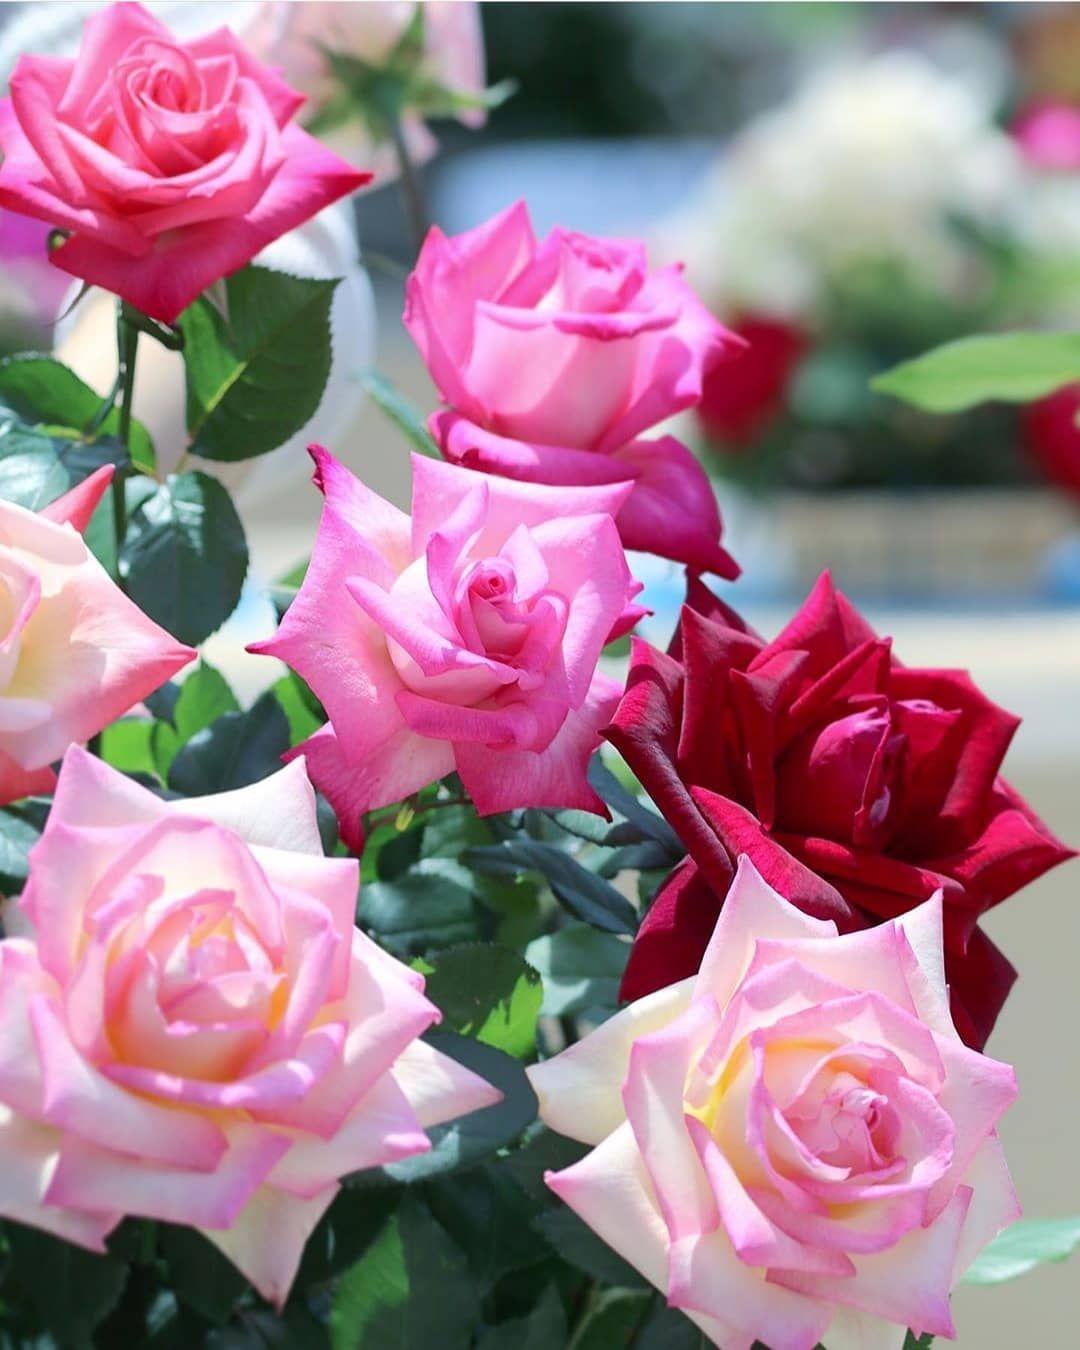 #happydays 💜💚❤ . #flower #roses #lovestory #gardendesign #nature_perfection #naturelovers #flowergarden #doğa #gül #çiçek #9vaga9 #photography #beautifull #follow #doğasevgisi #instalike #istanbul #turkey #europe